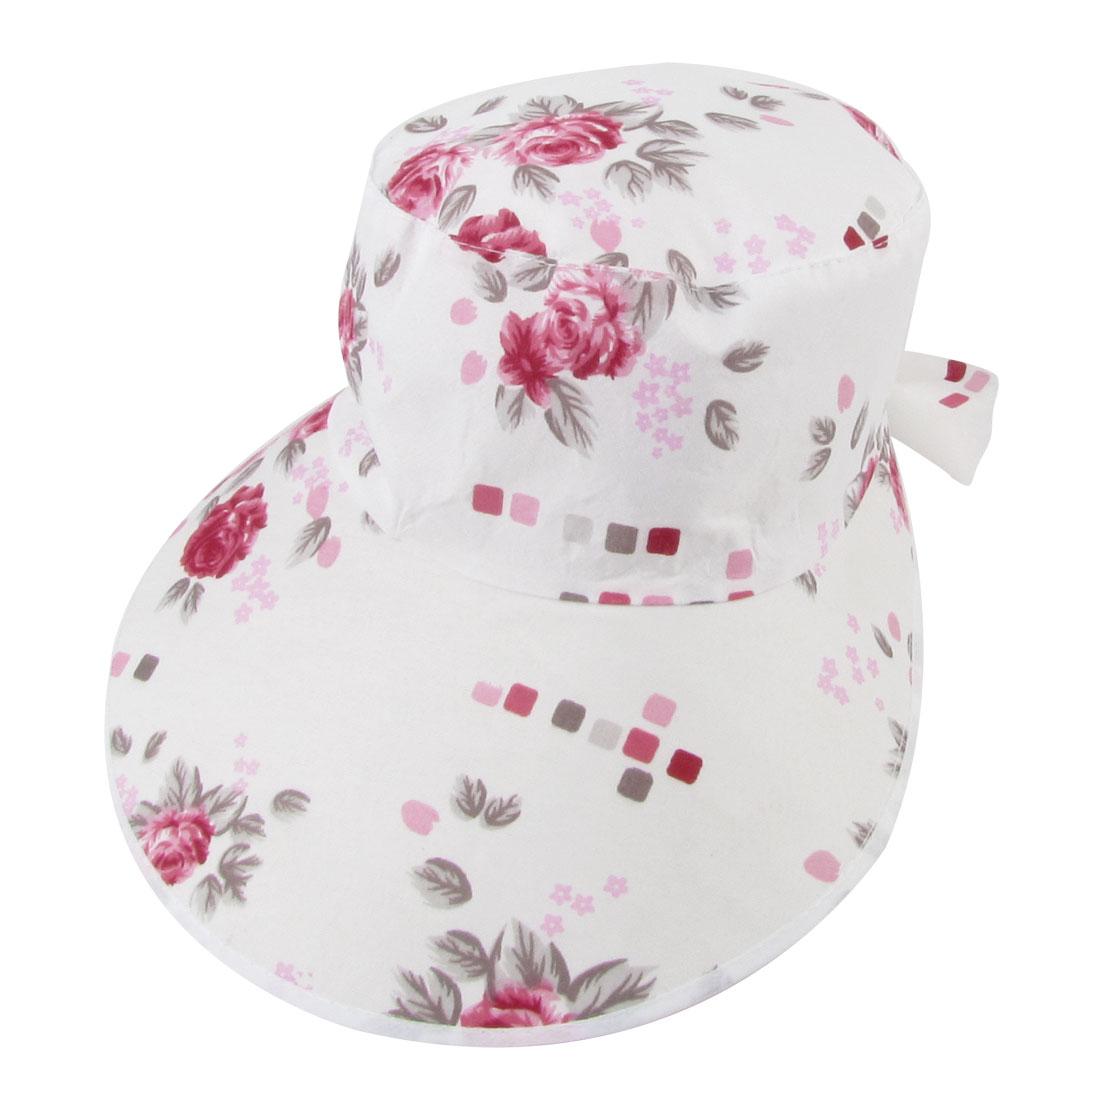 Lady Florals Pattern Wide Brim Outdoor Beach Visor Hat Cap Red White